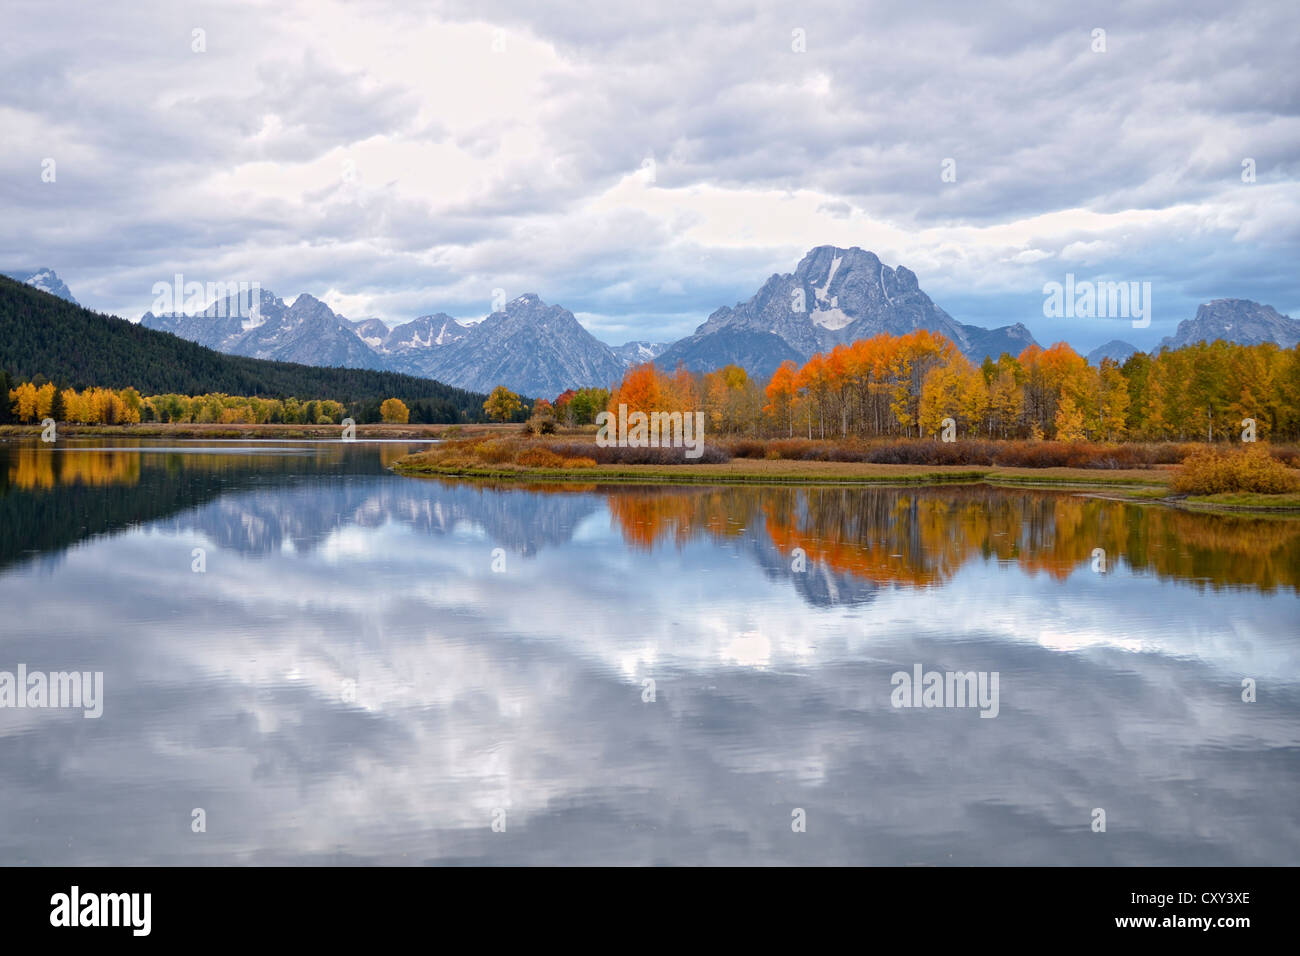 Reflections in Snake River, Teton Range, Mount Moran, centre, Oxbow Bend Turnout, Federal Road 287, Grand Teton - Stock Image